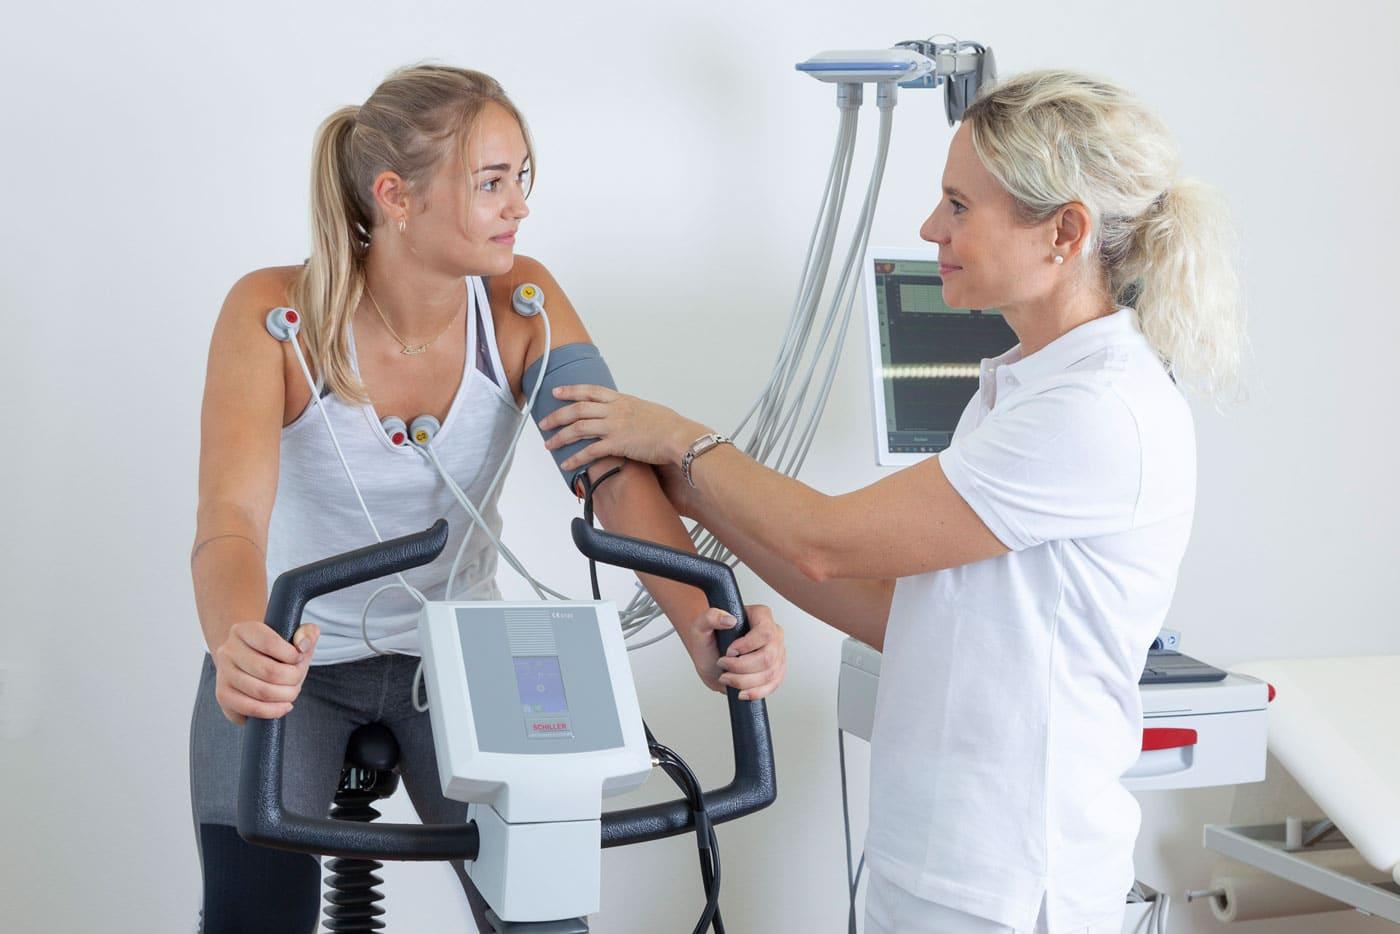 Belastungs-EKG - Dr. med. univ. Julia Fuchs // Fachärztin